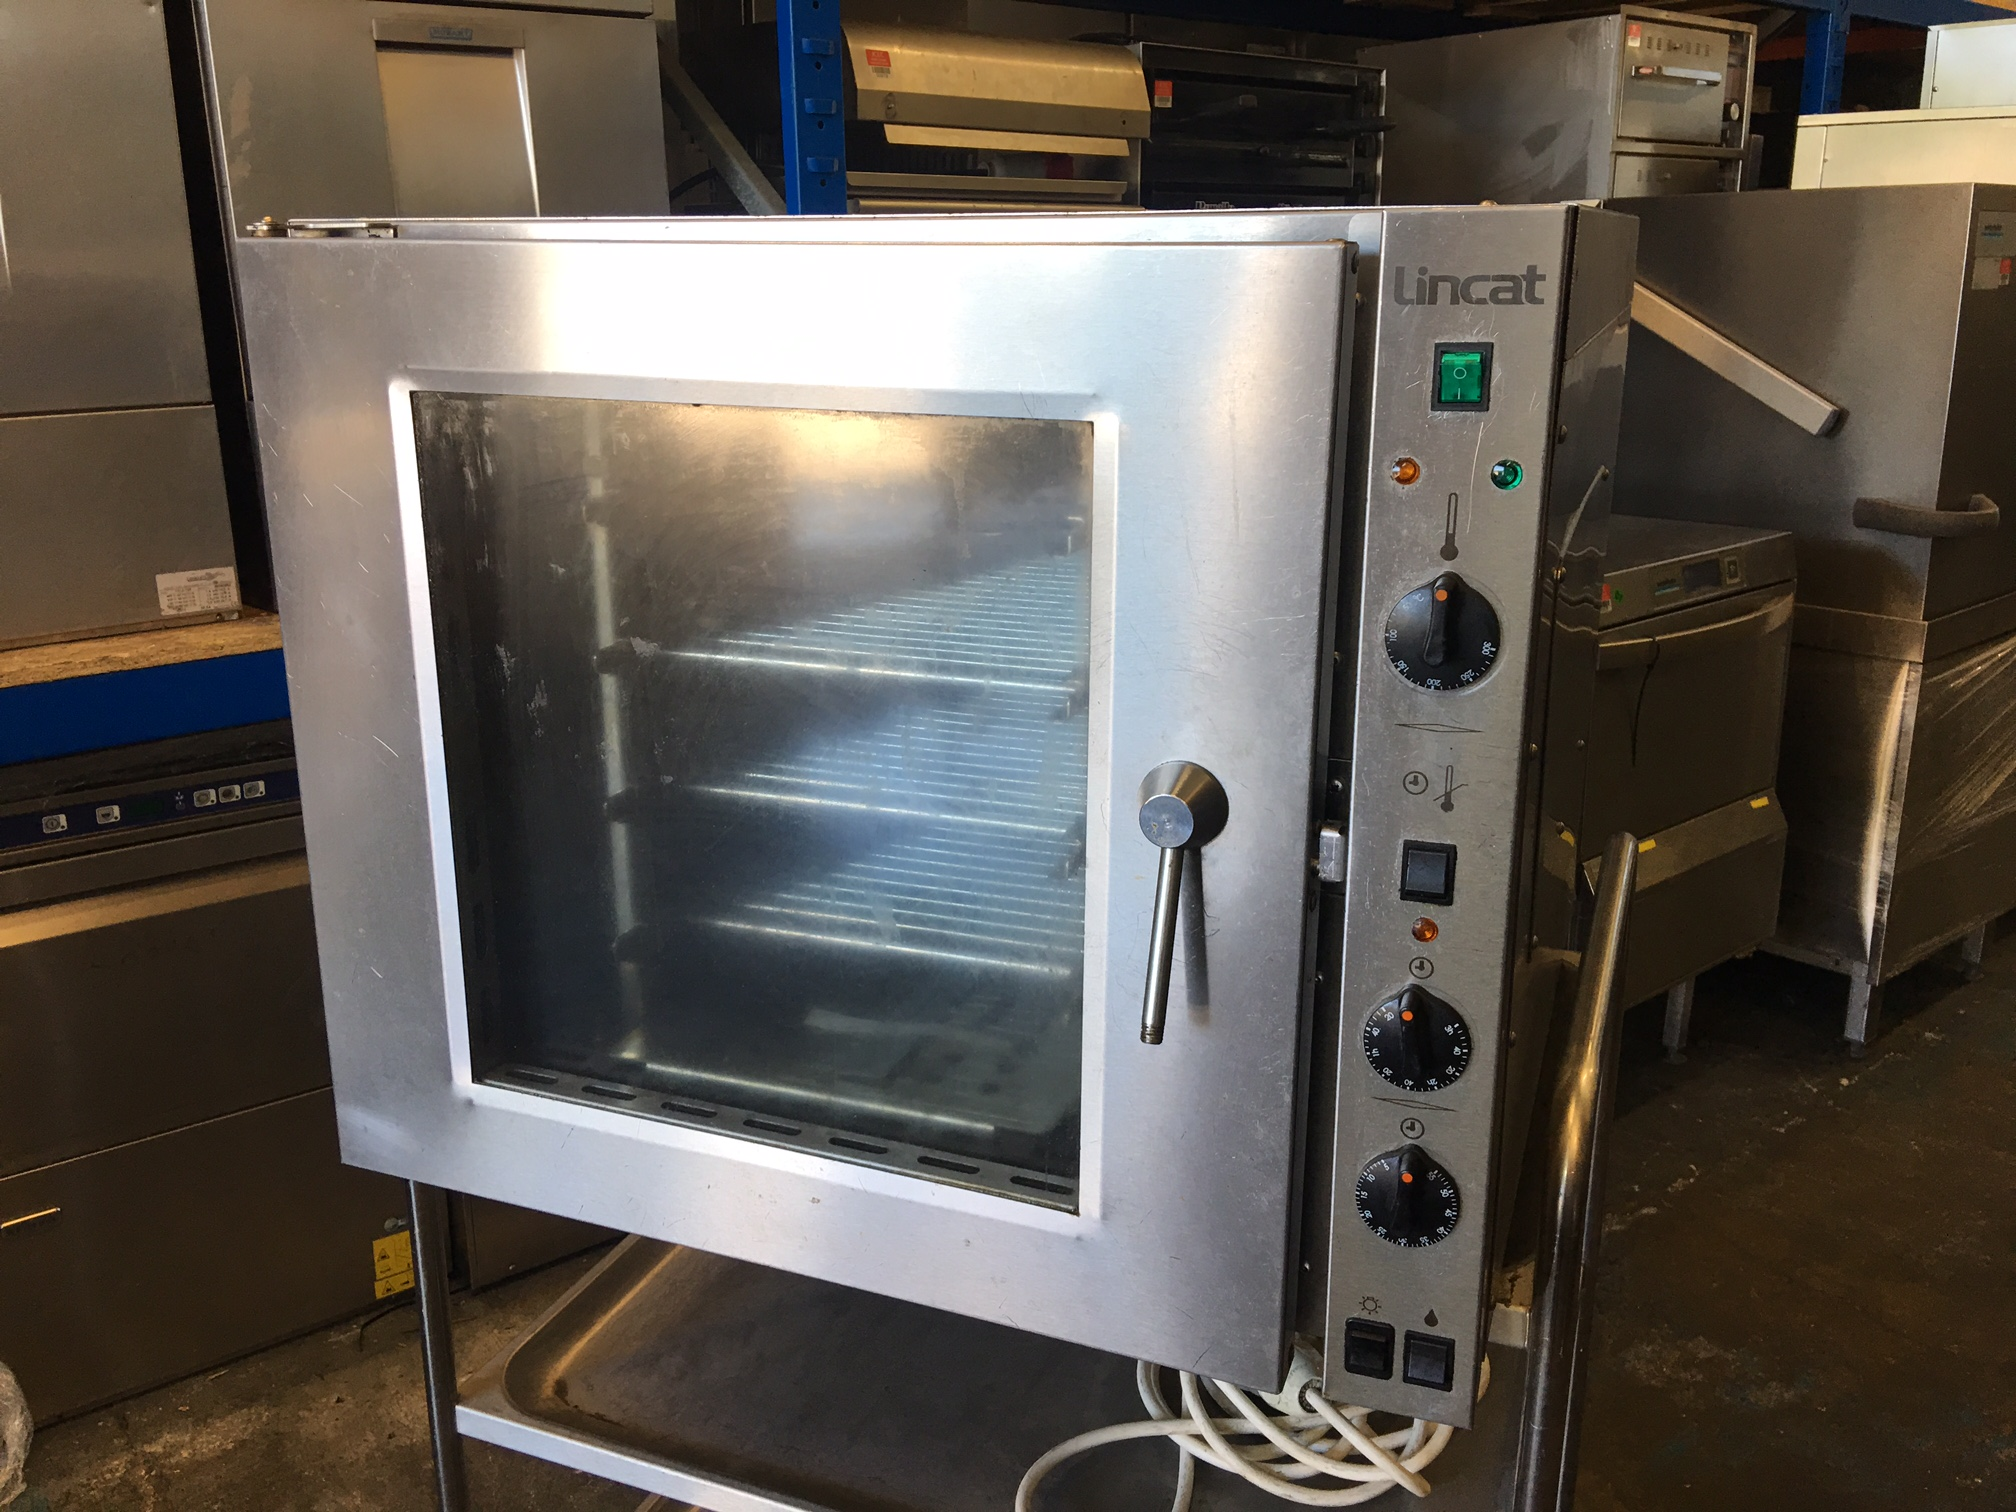 Lincat 99 Ltr Counter Top Convection Oven Steamer Peri